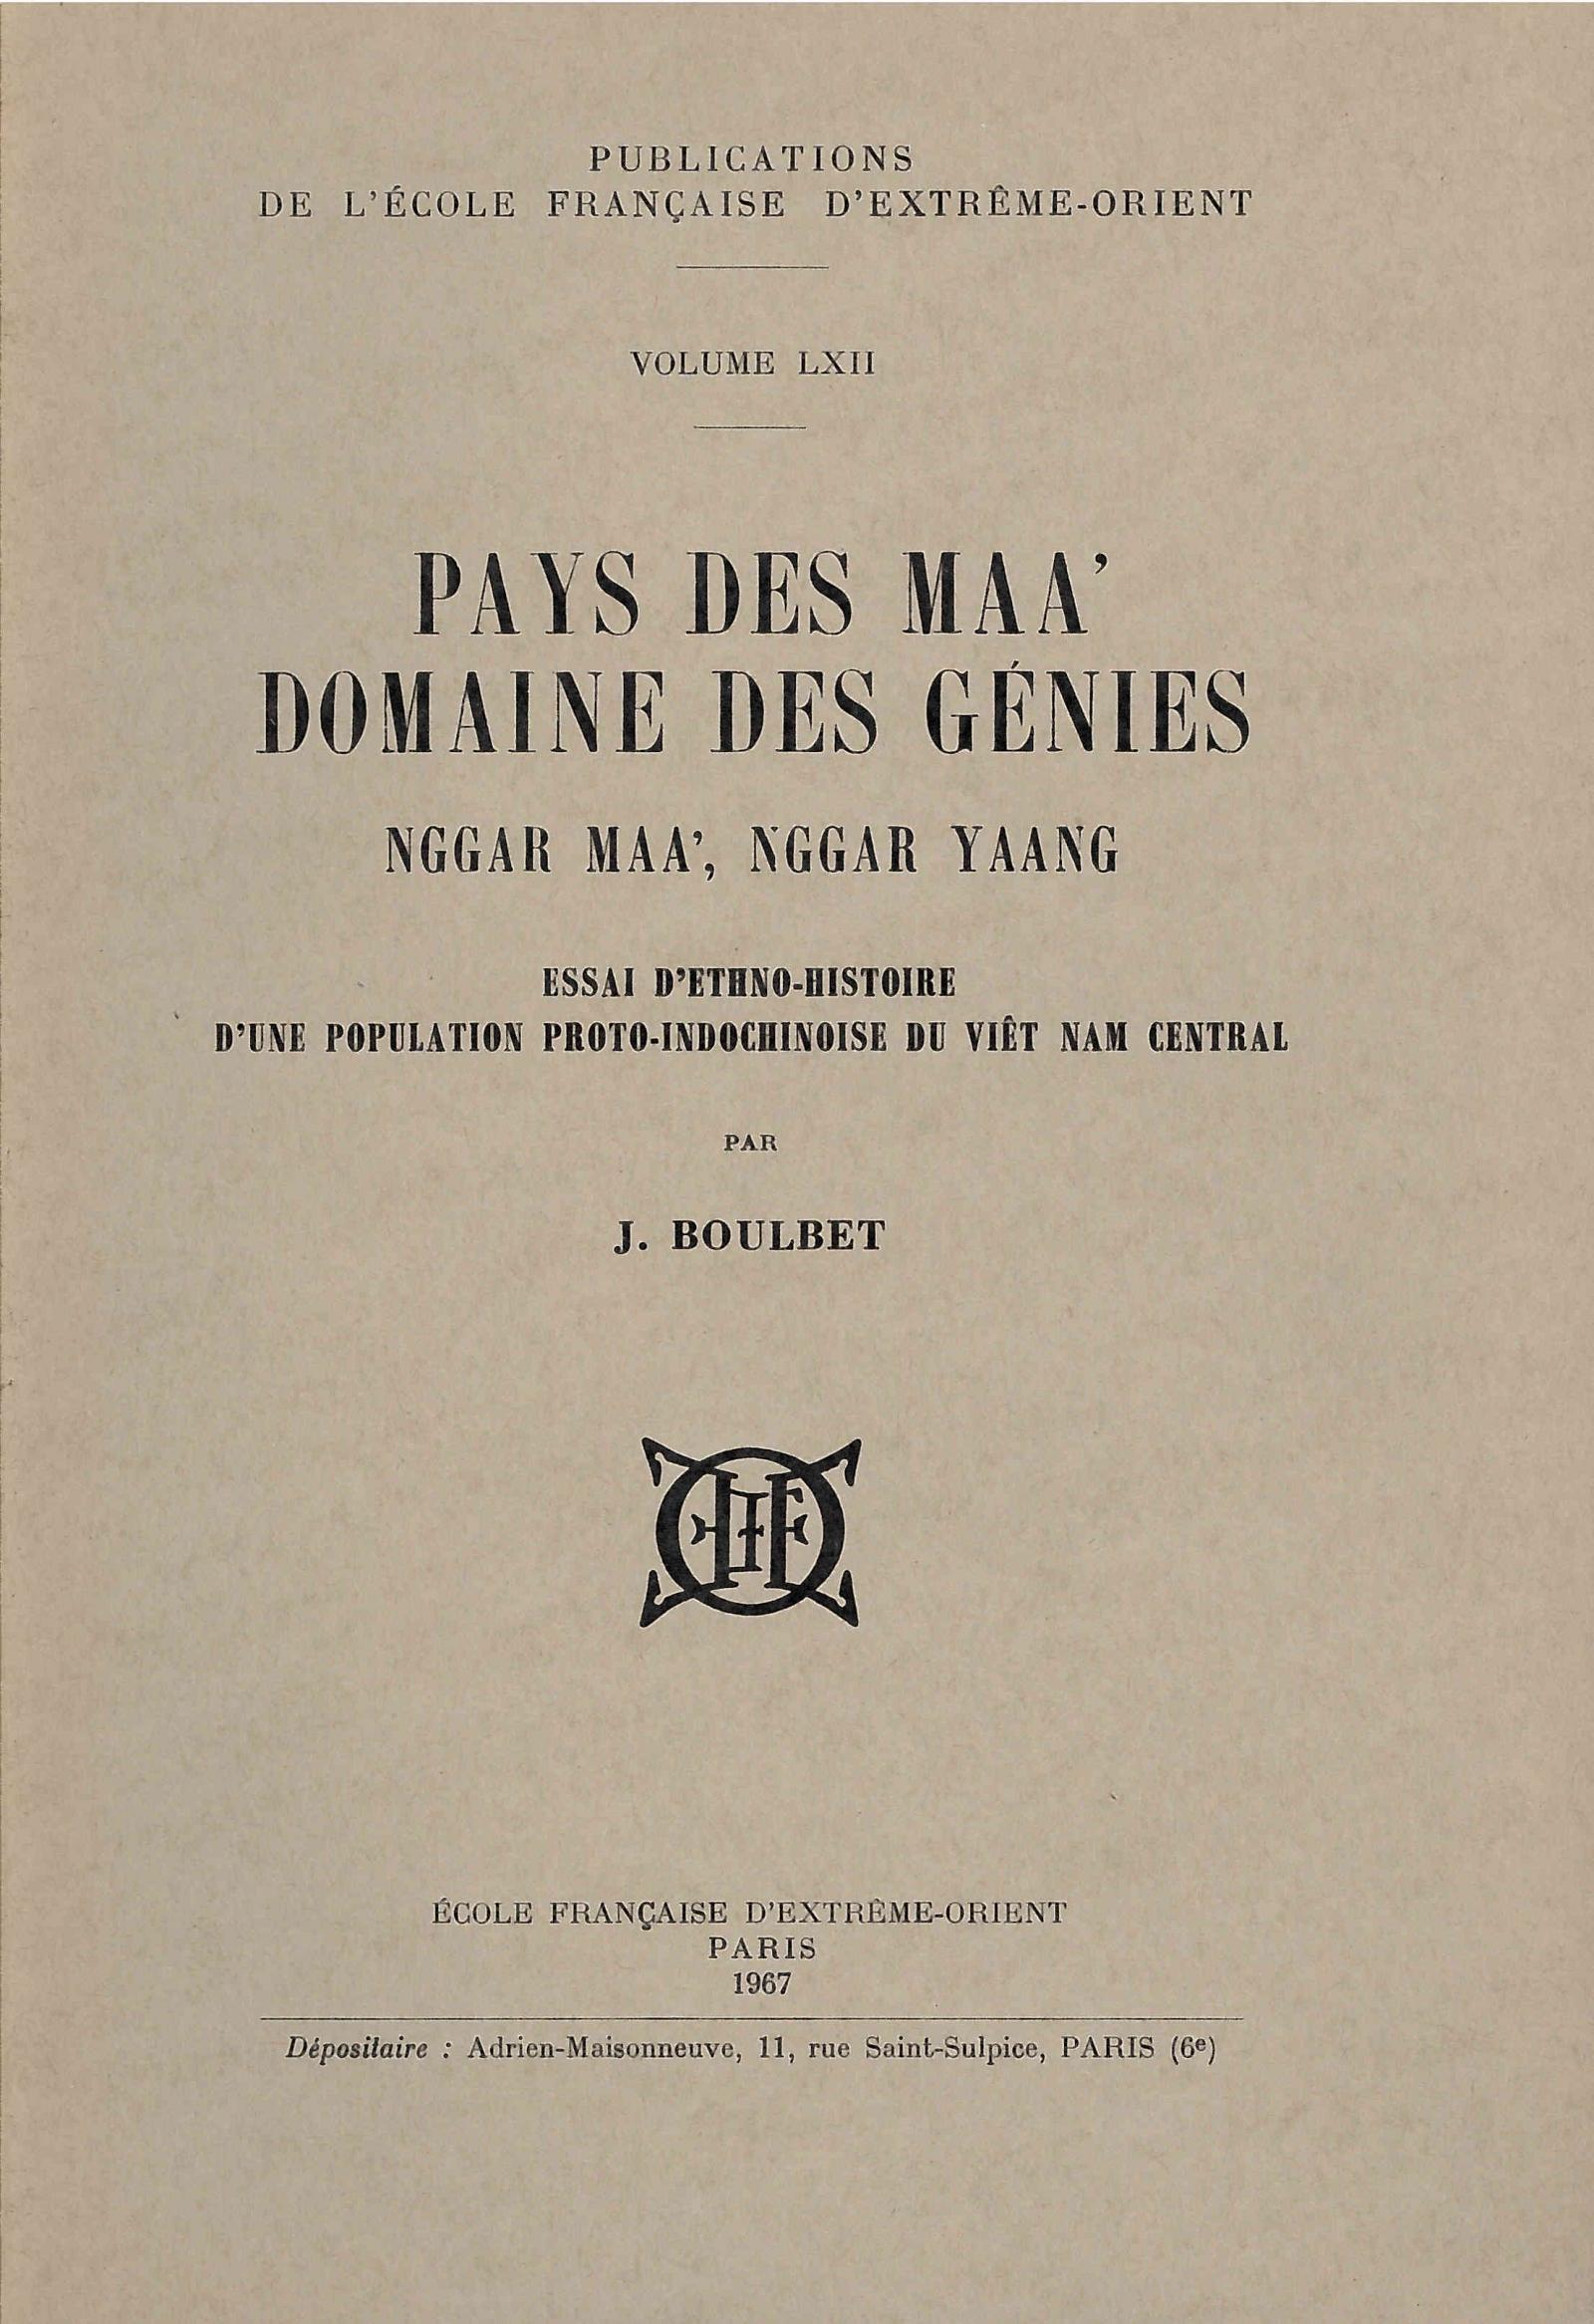 Pays des Maa', domaine des génies, Nggar Maa', Nggar Yang, essai d'ethno-histoire d'une population proto-indochinoise du Viêt Nam central